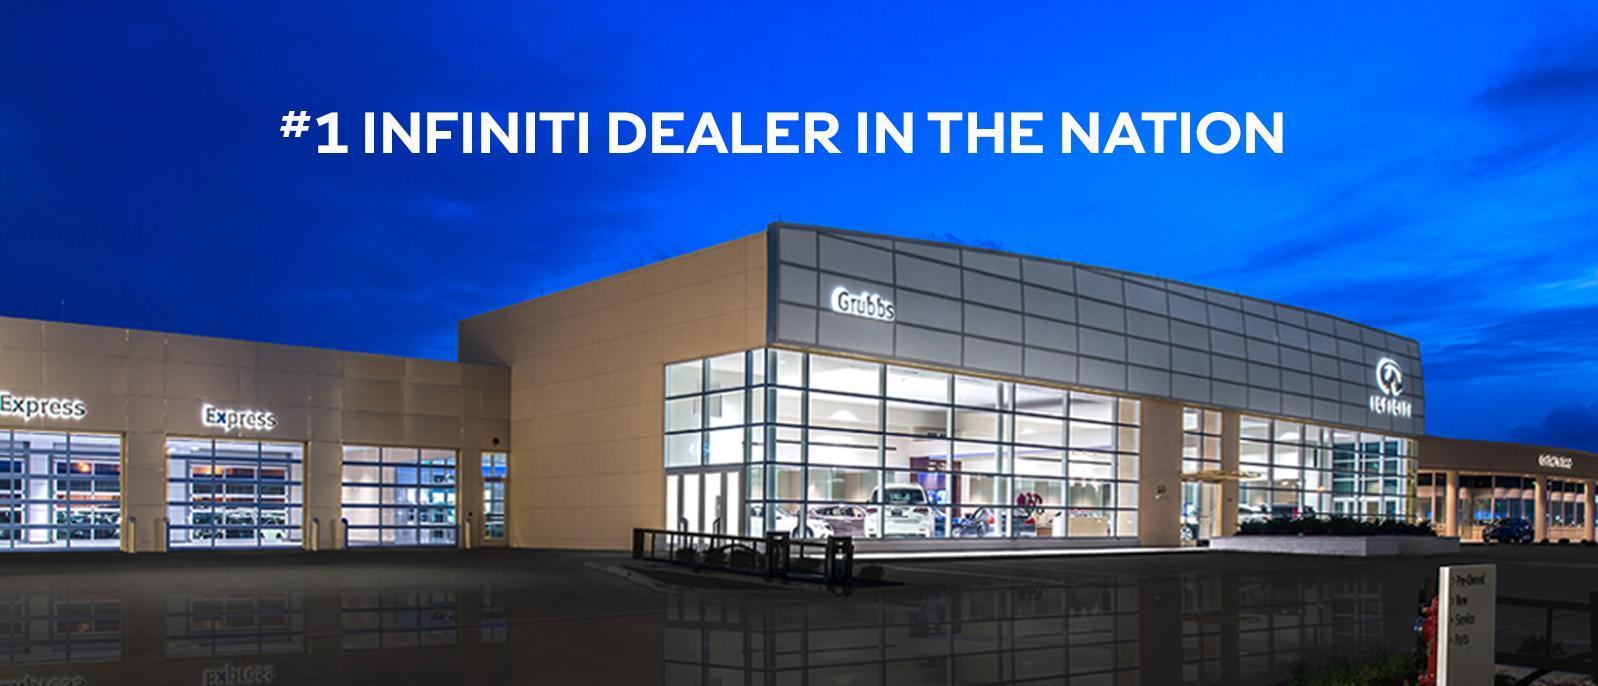 Infiniti Dealer in the Nation